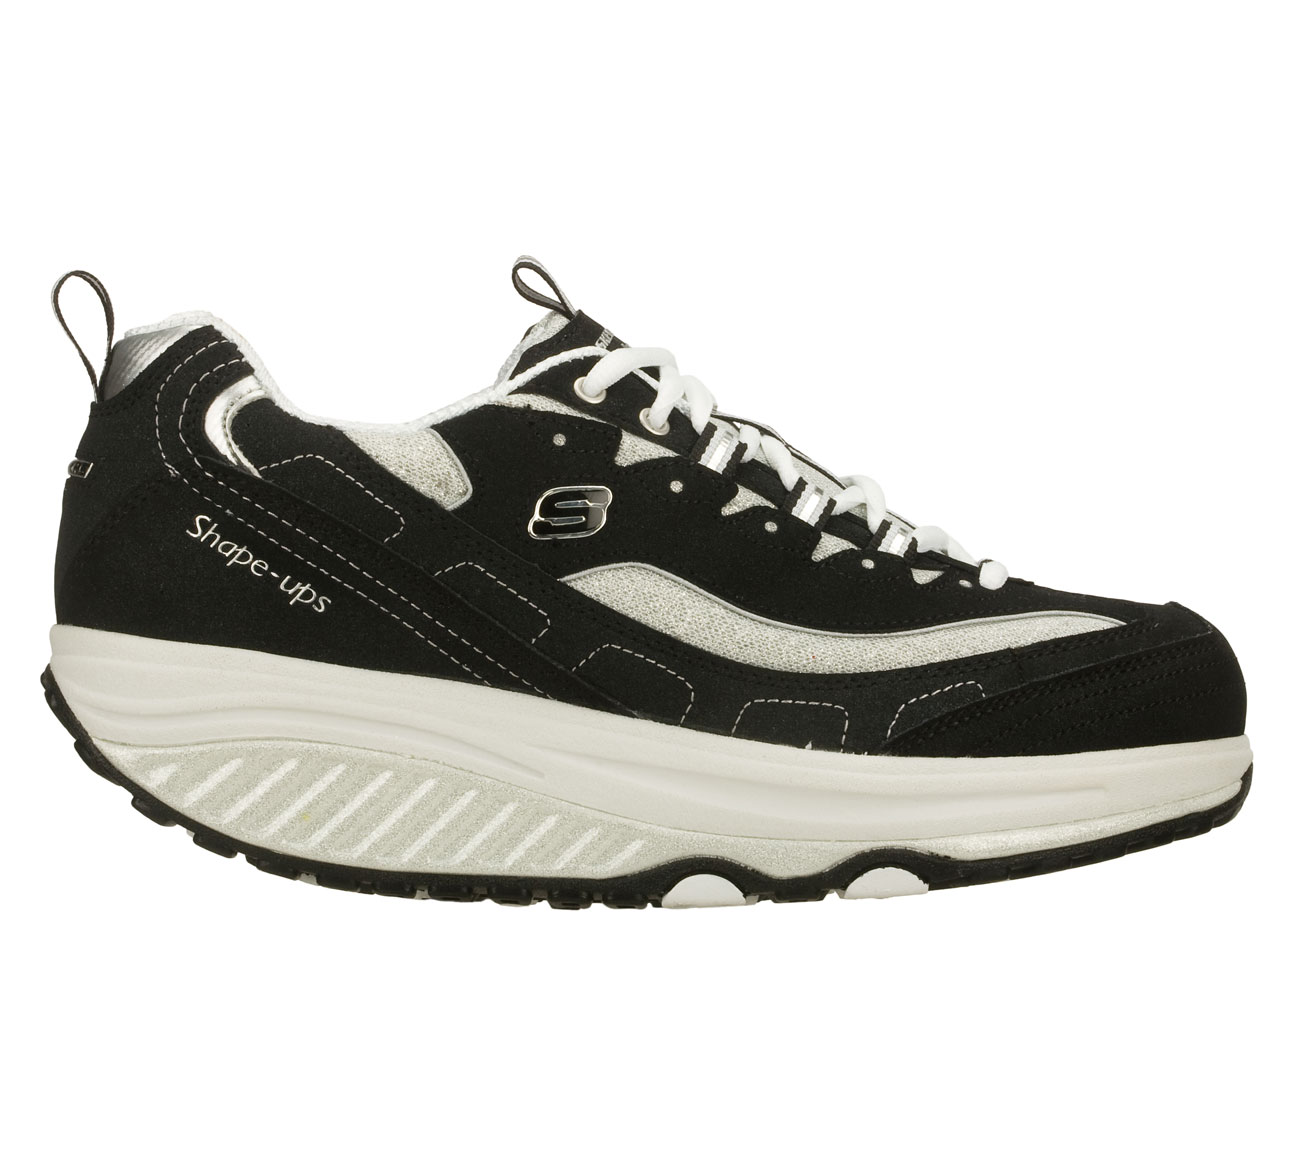 sketchers shoes cheap skechers shoes online EWGLRZU